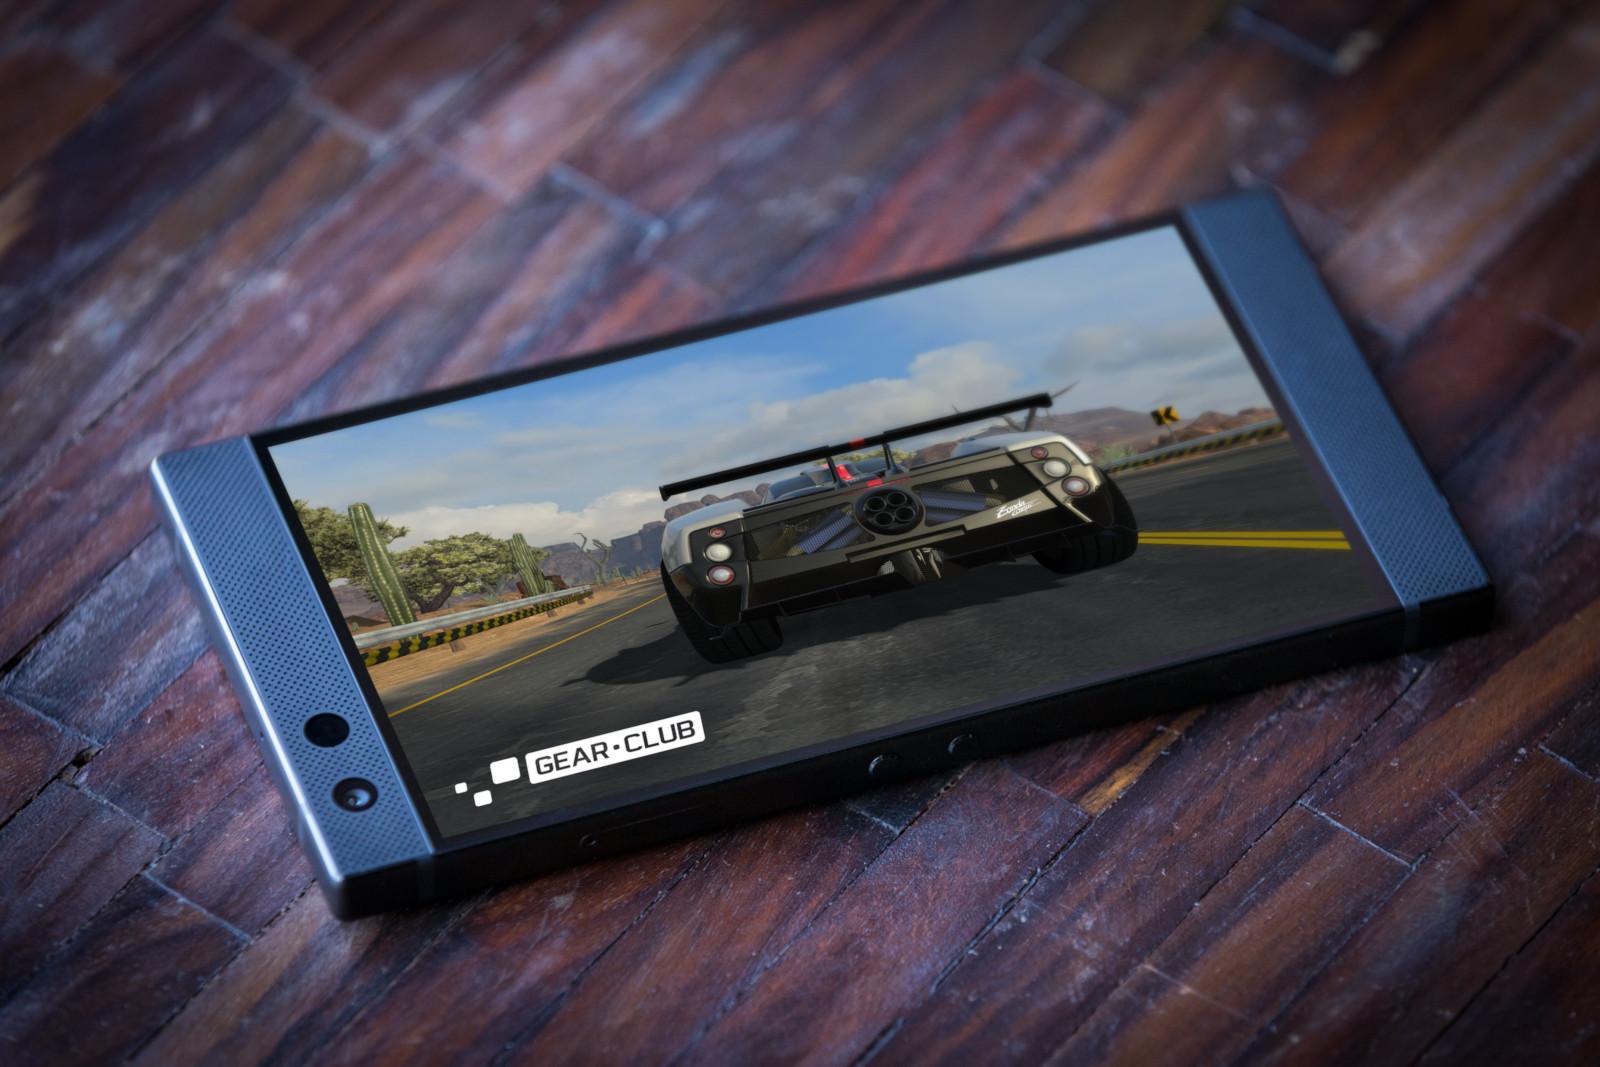 Razer Phone 2 PRET SPECIFICATII LANSARE 2